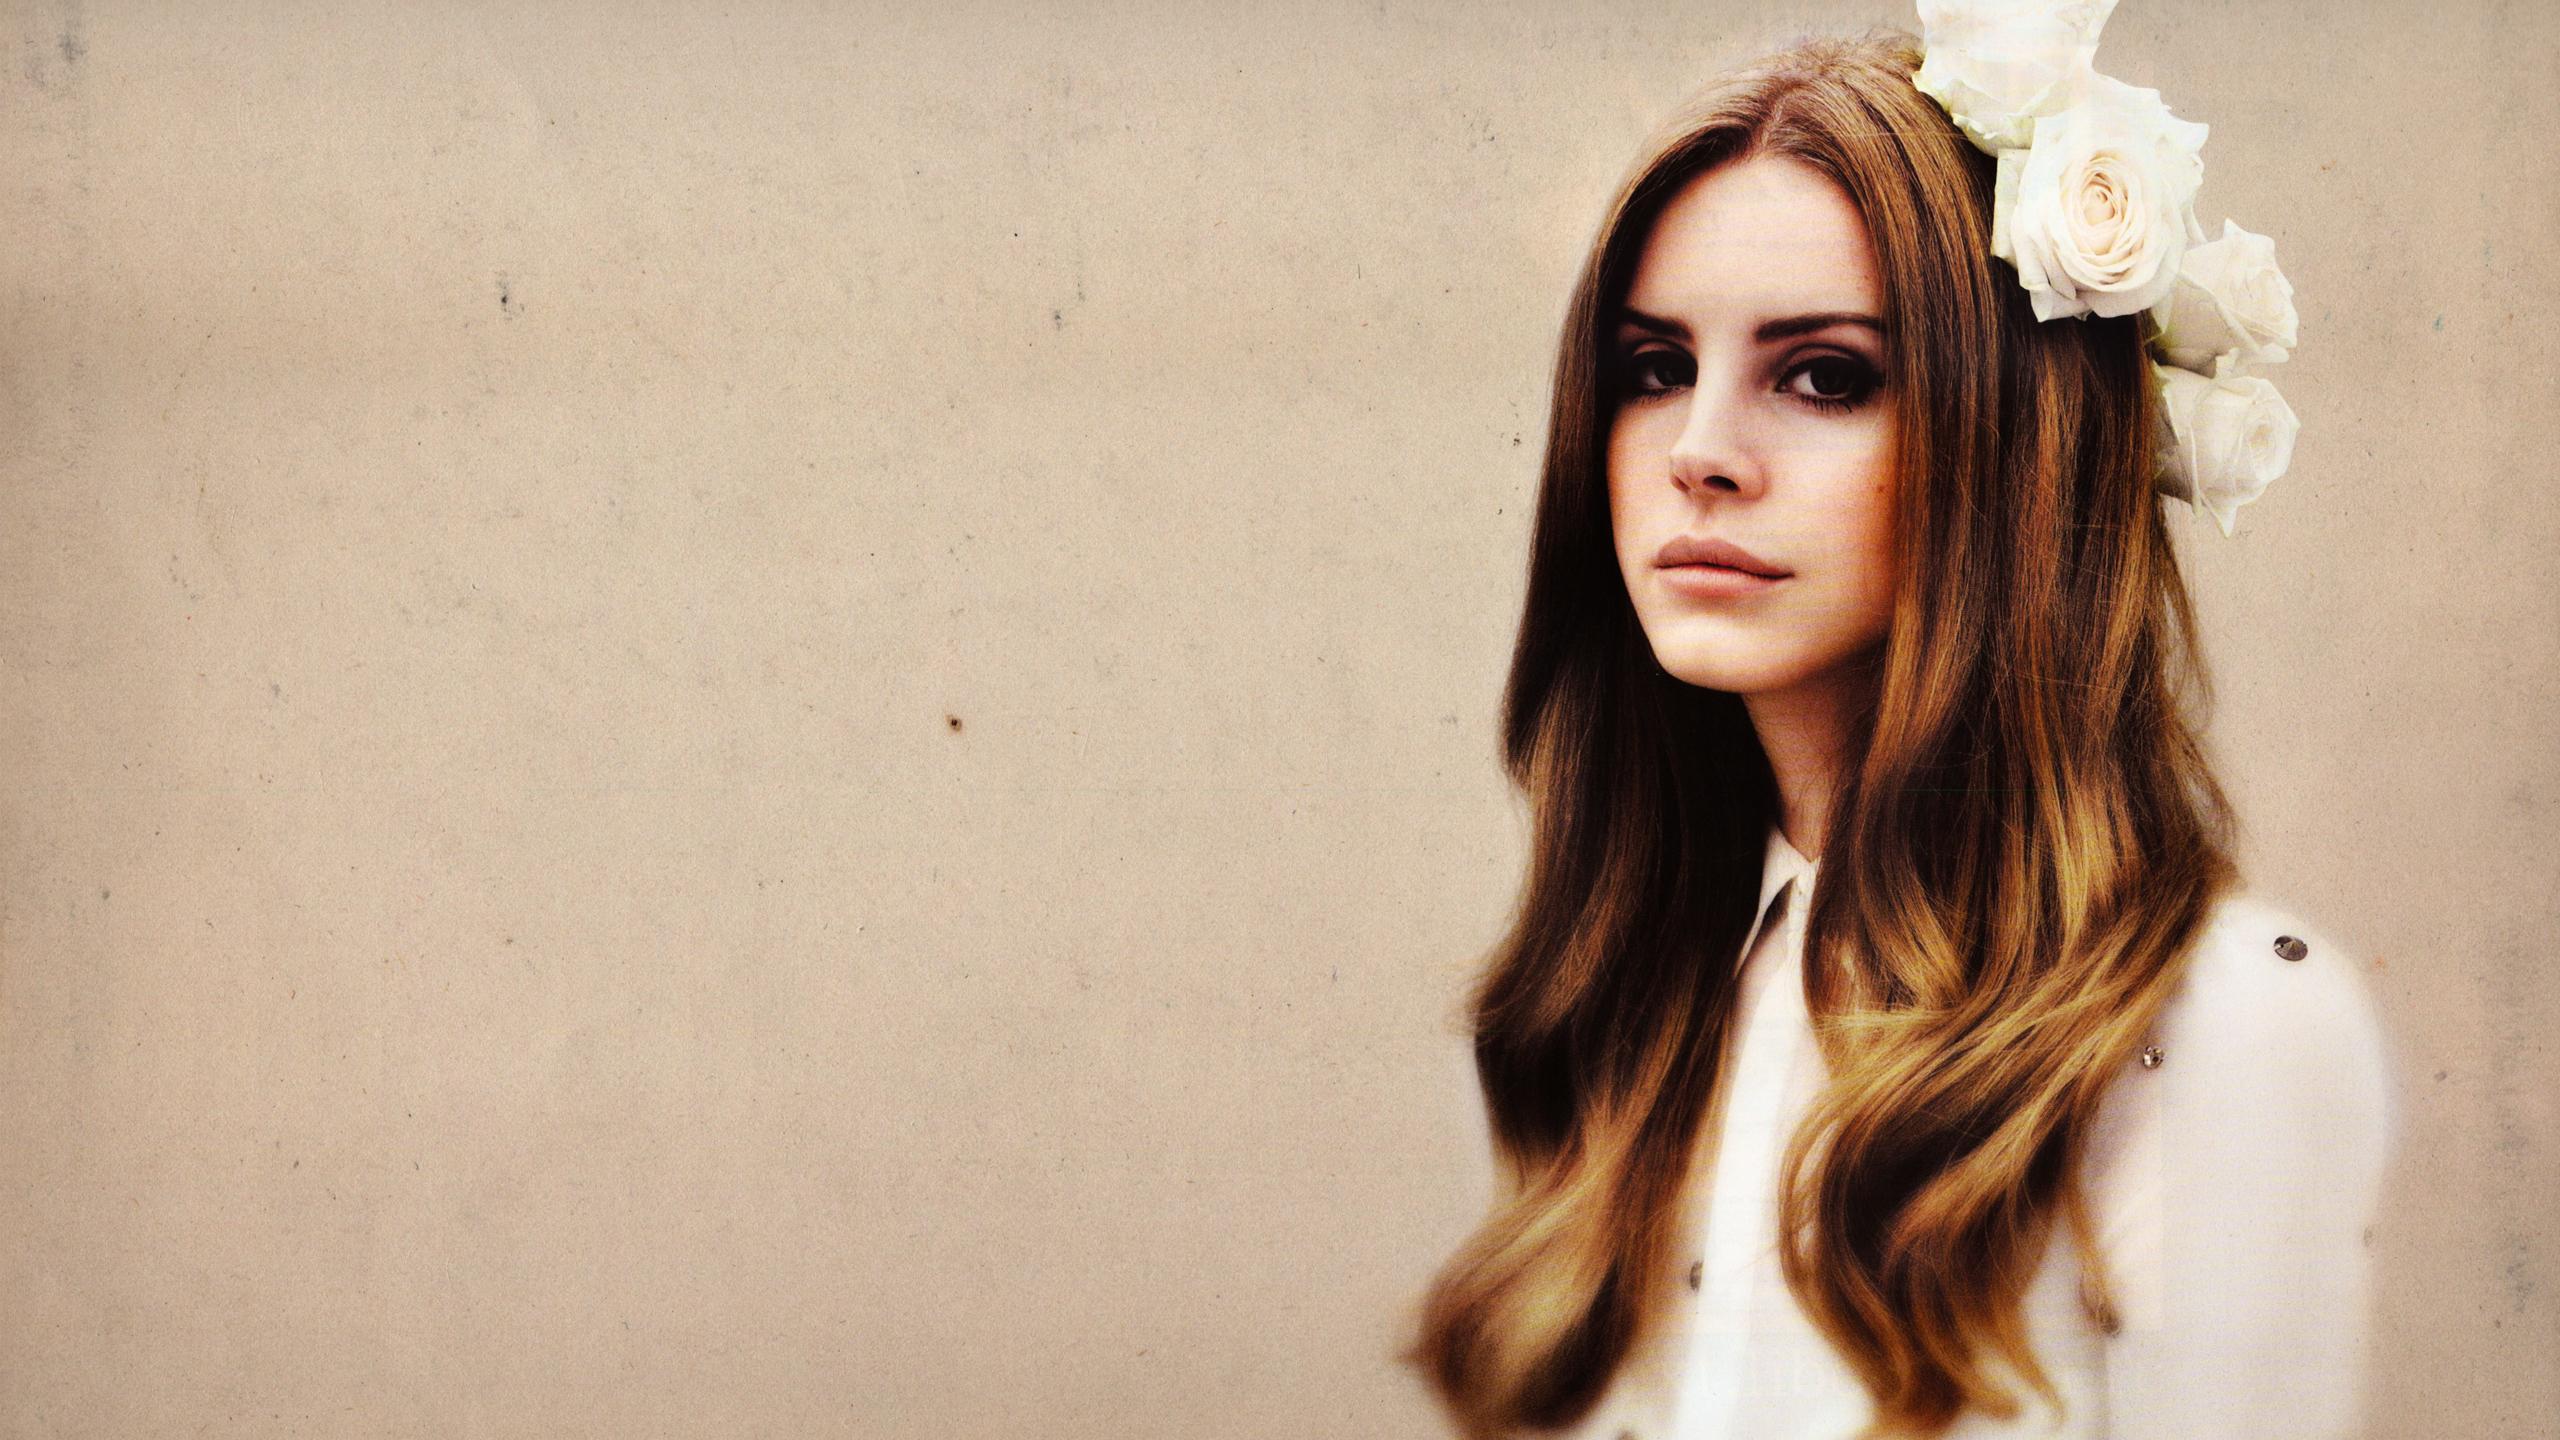 LanaWallpaper   Lana Del Rey Wallpaper 31900671 2560x1440